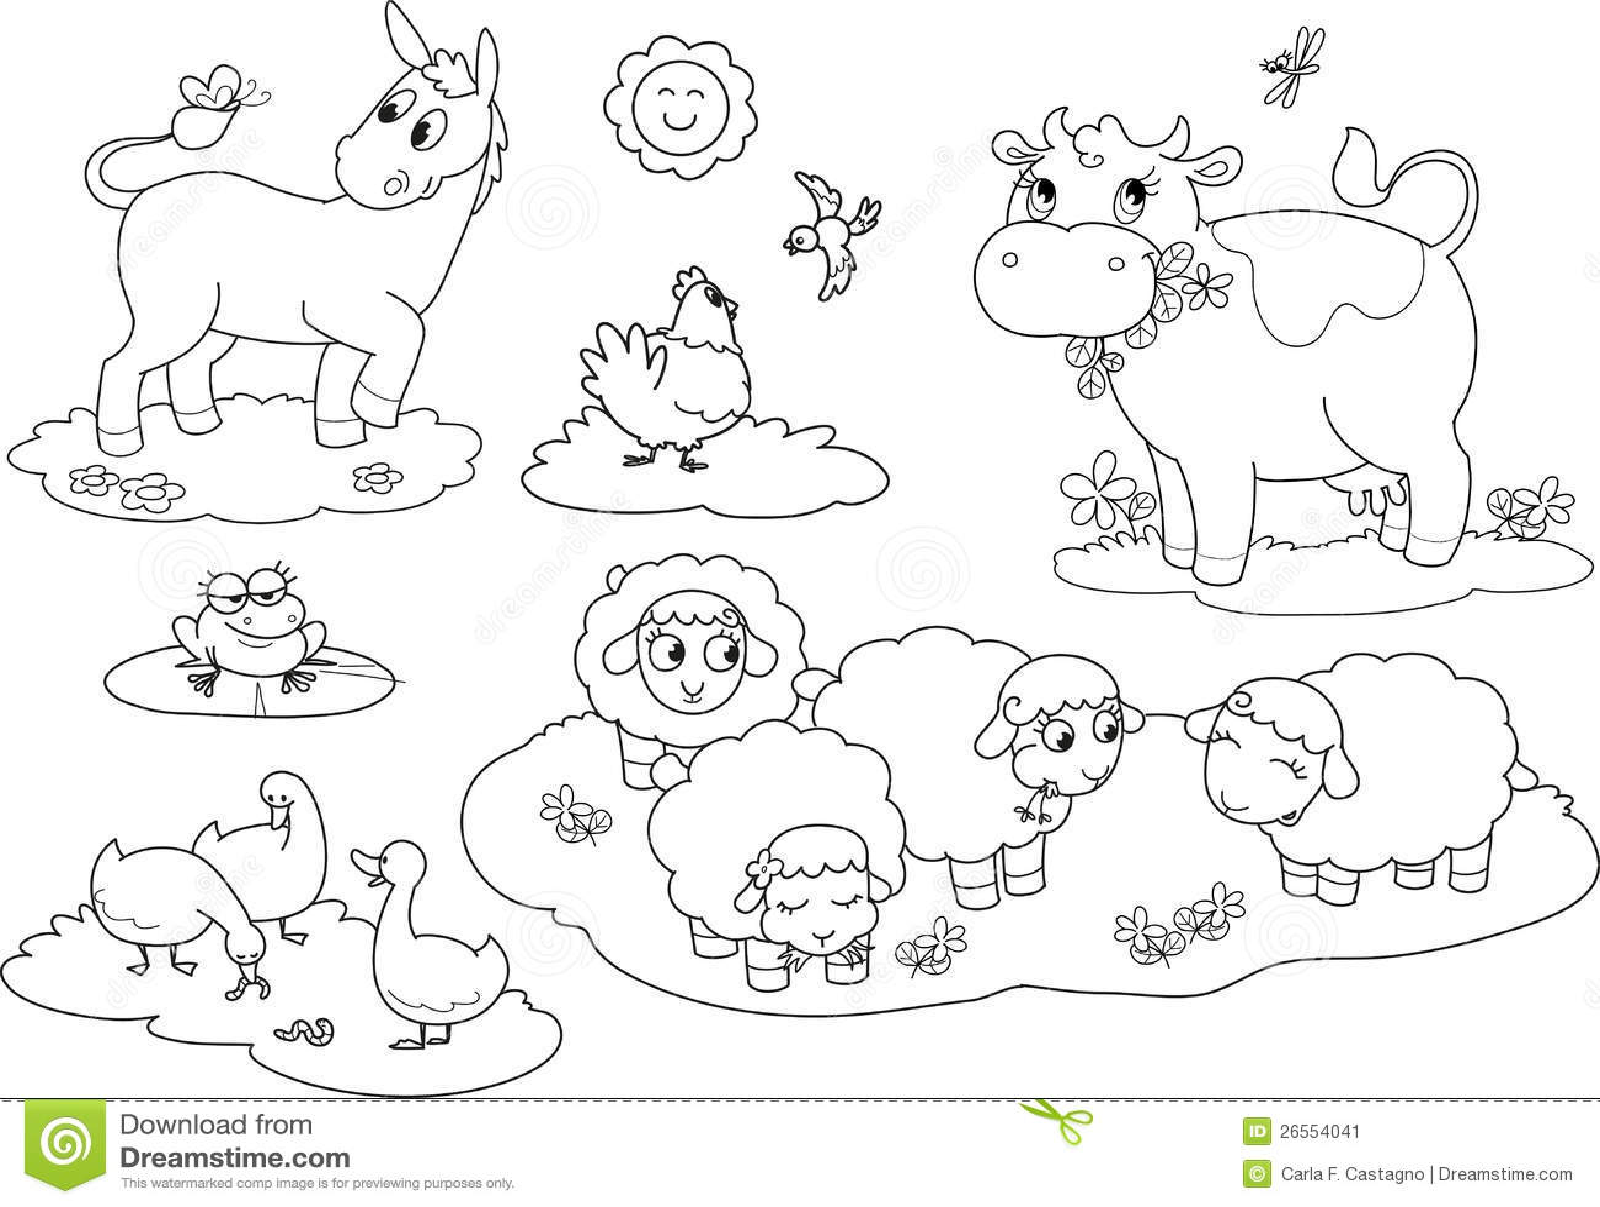 Coloring Farm Animals 2 Stock Image